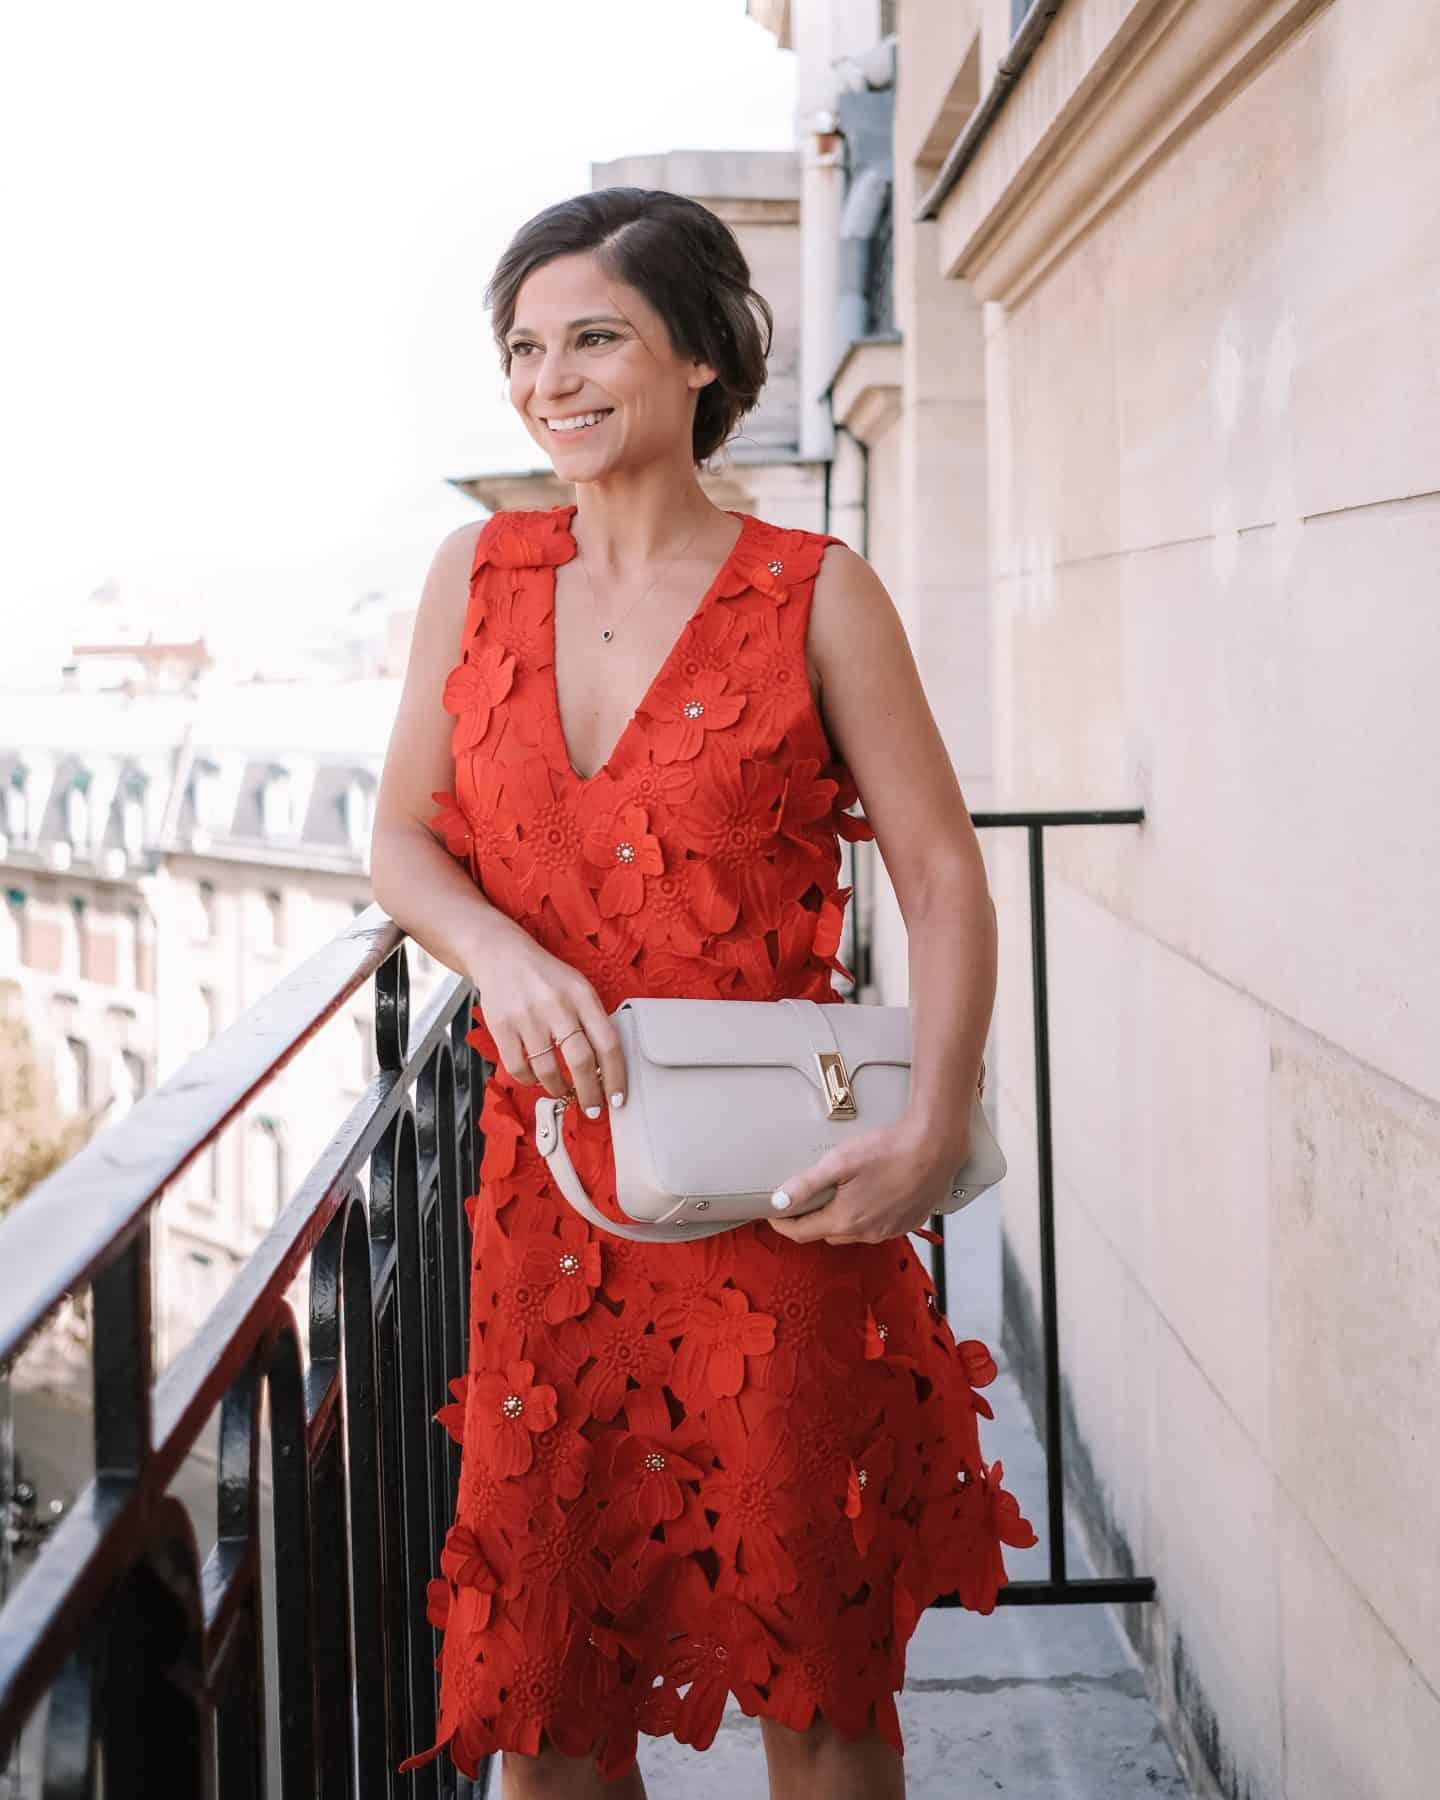 red michael kors flower dress and lancaster beige bag how many handbags